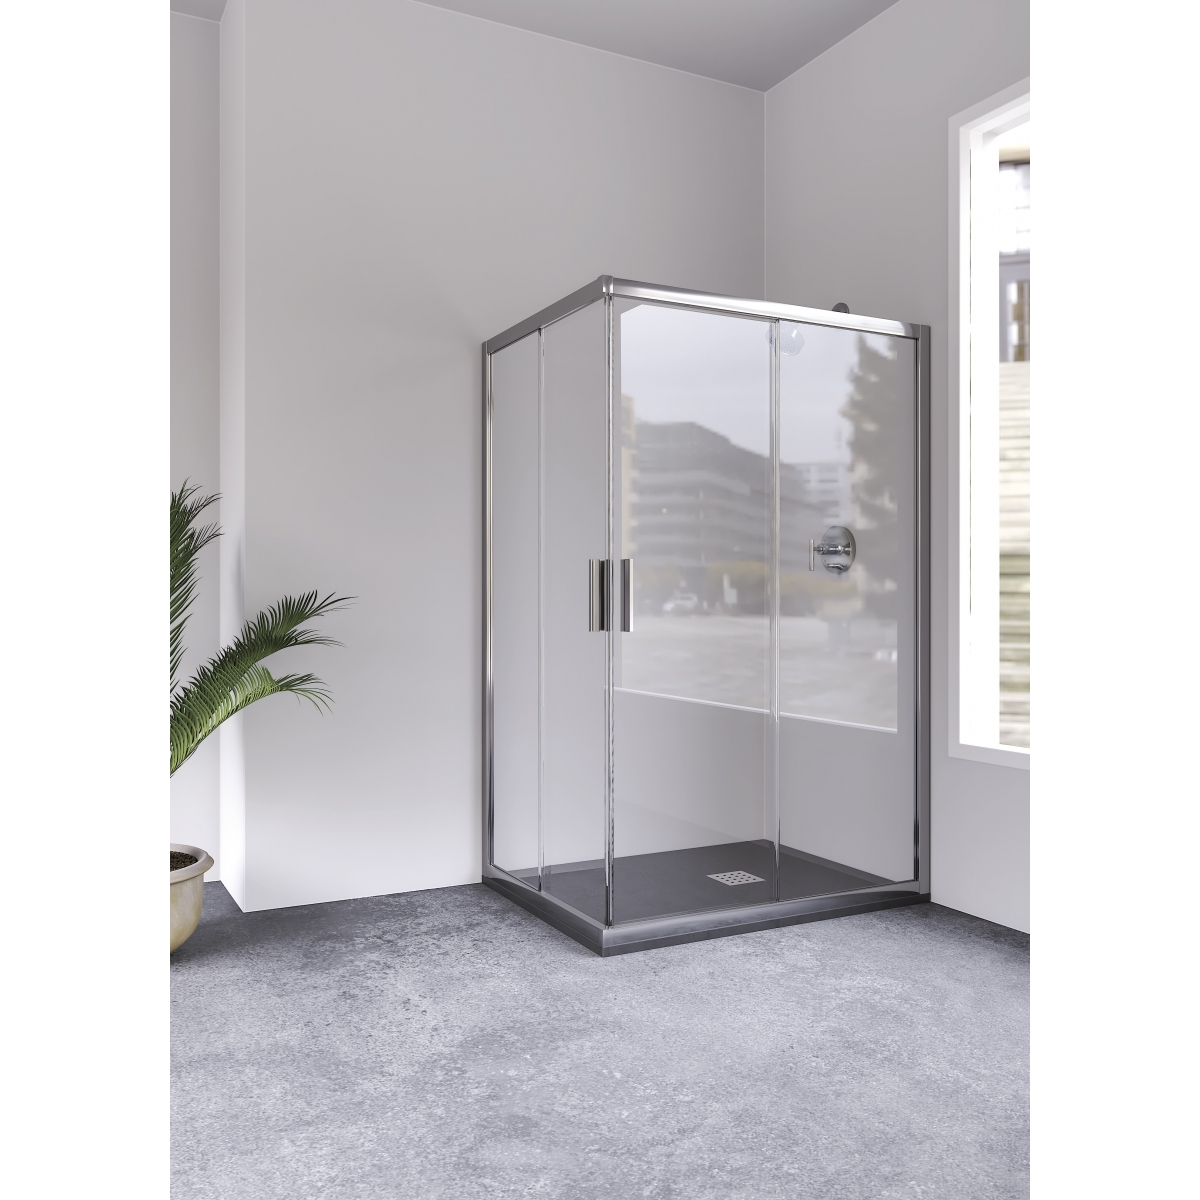 Mampara económica para ducha Orinoco Anna Bagno